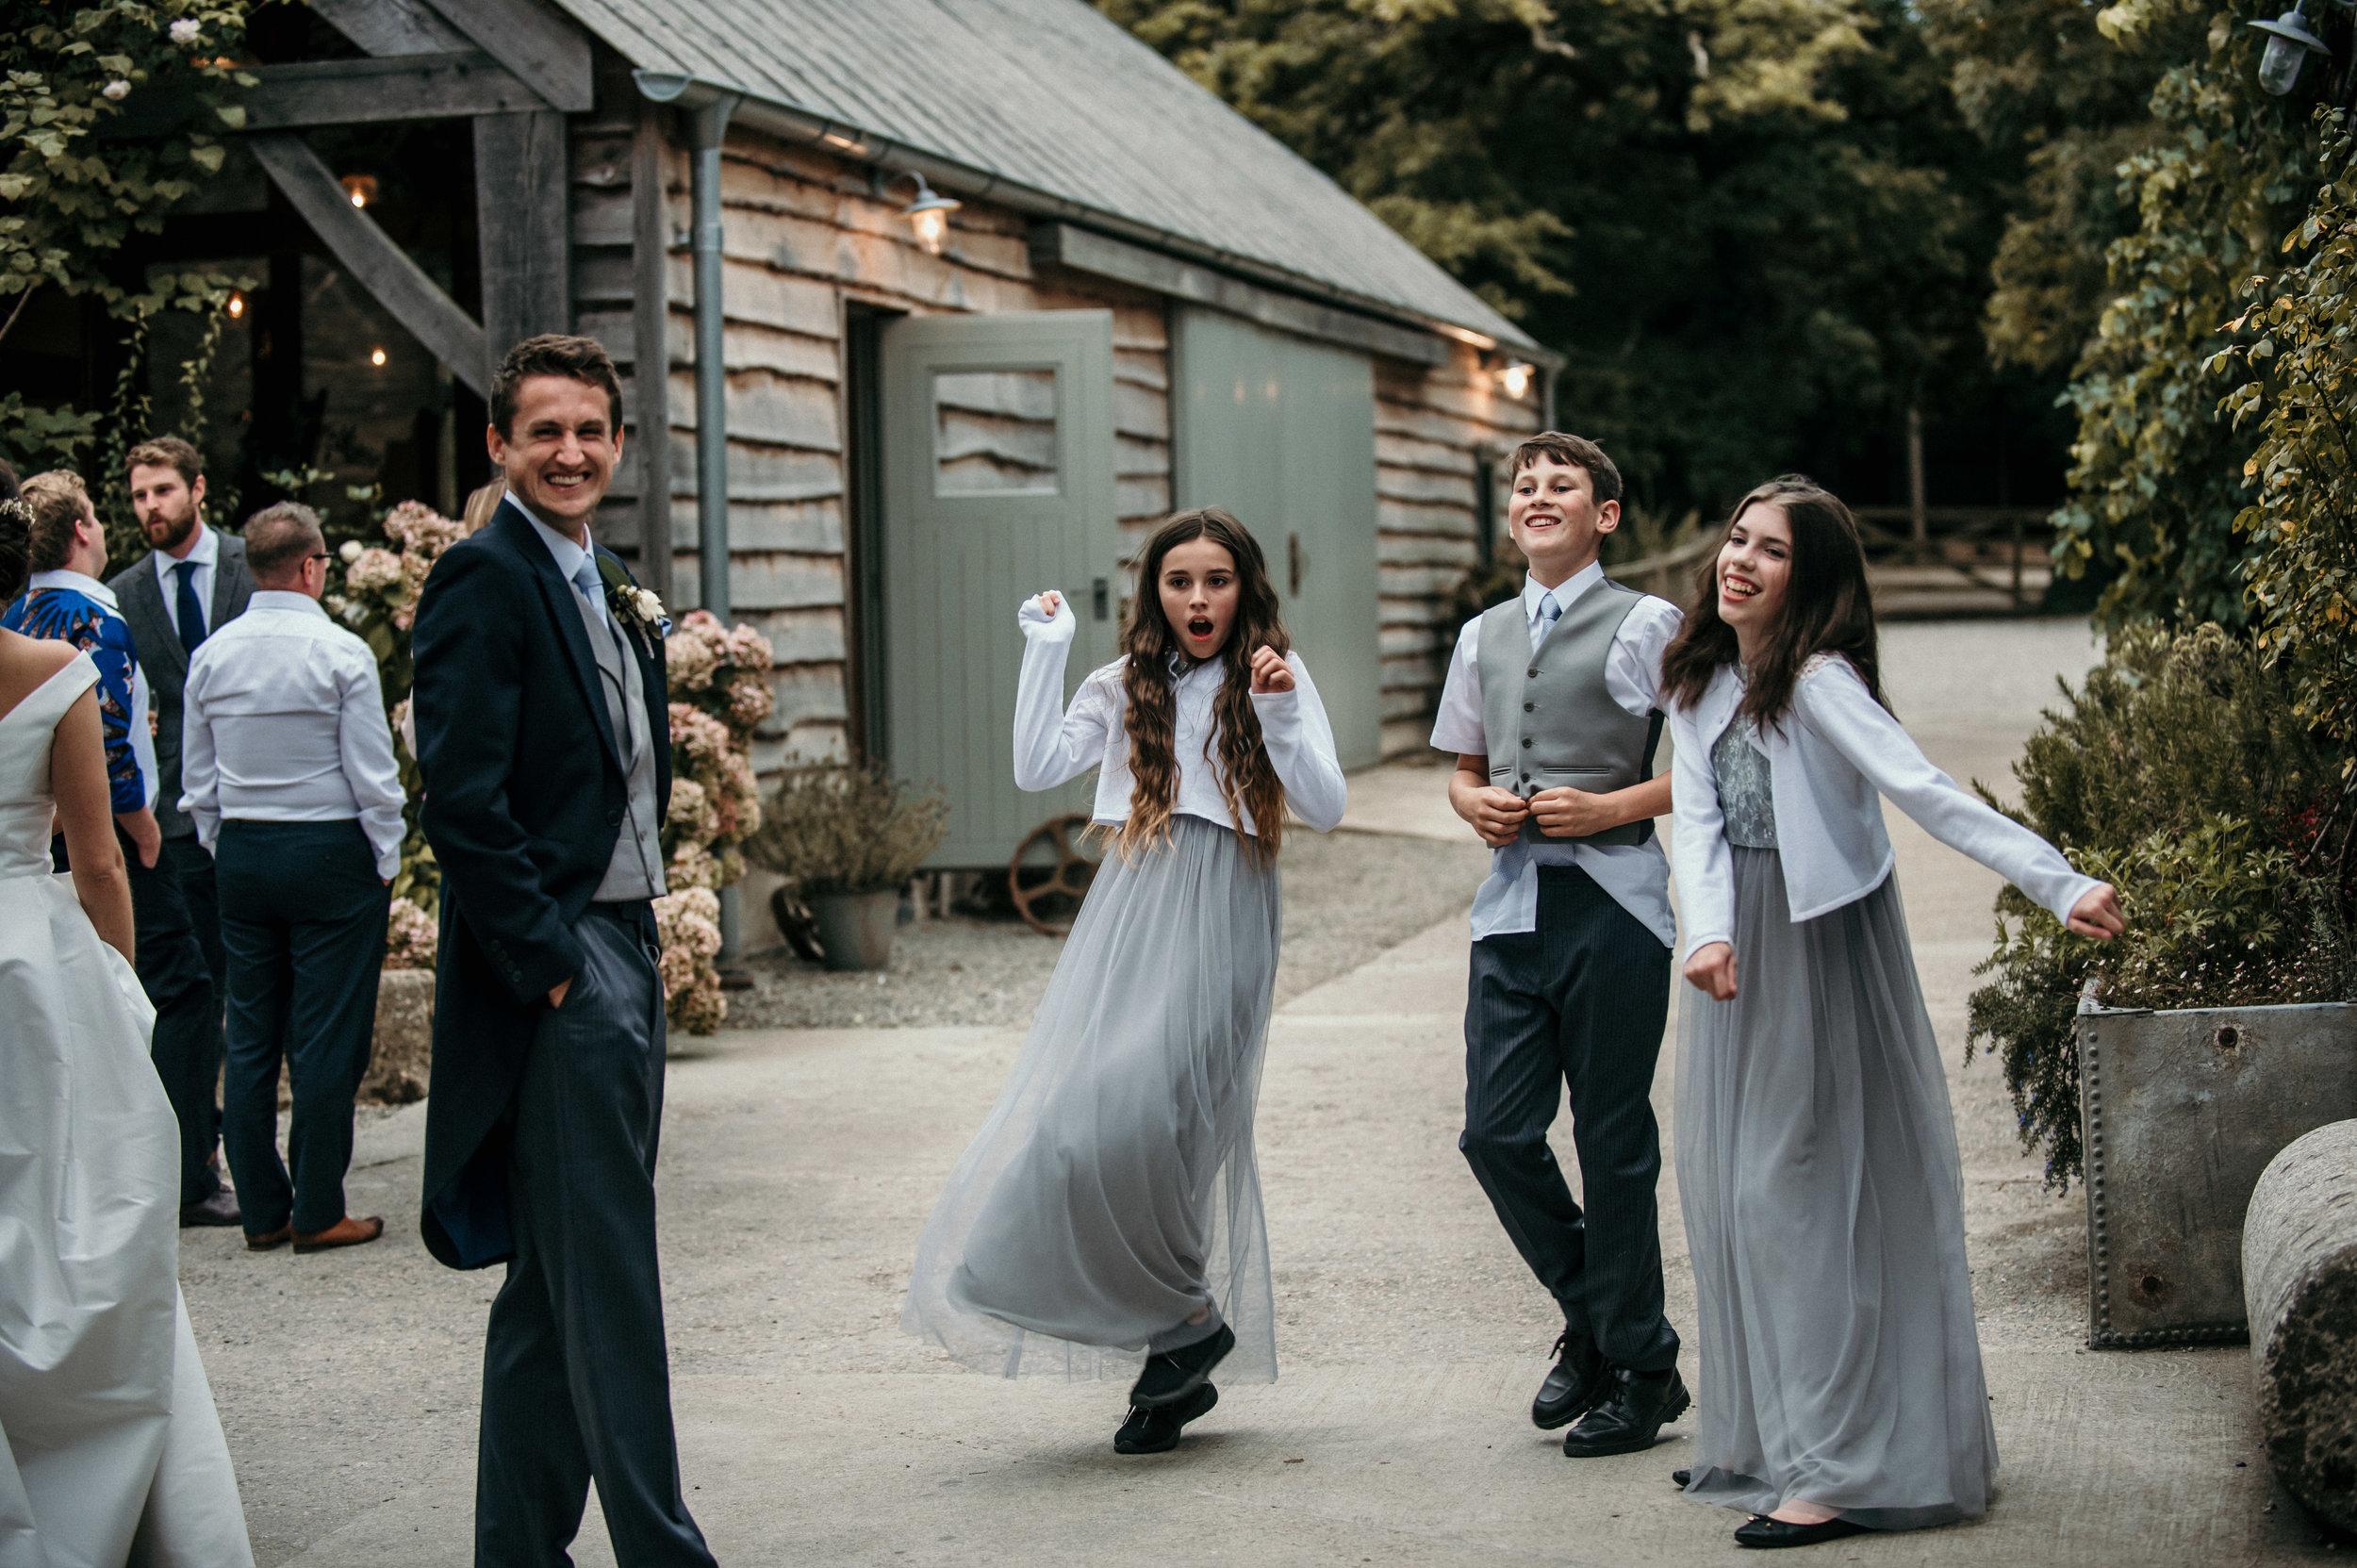 nancarrow-farm-wedding-photographer-cornwall-55.jpg